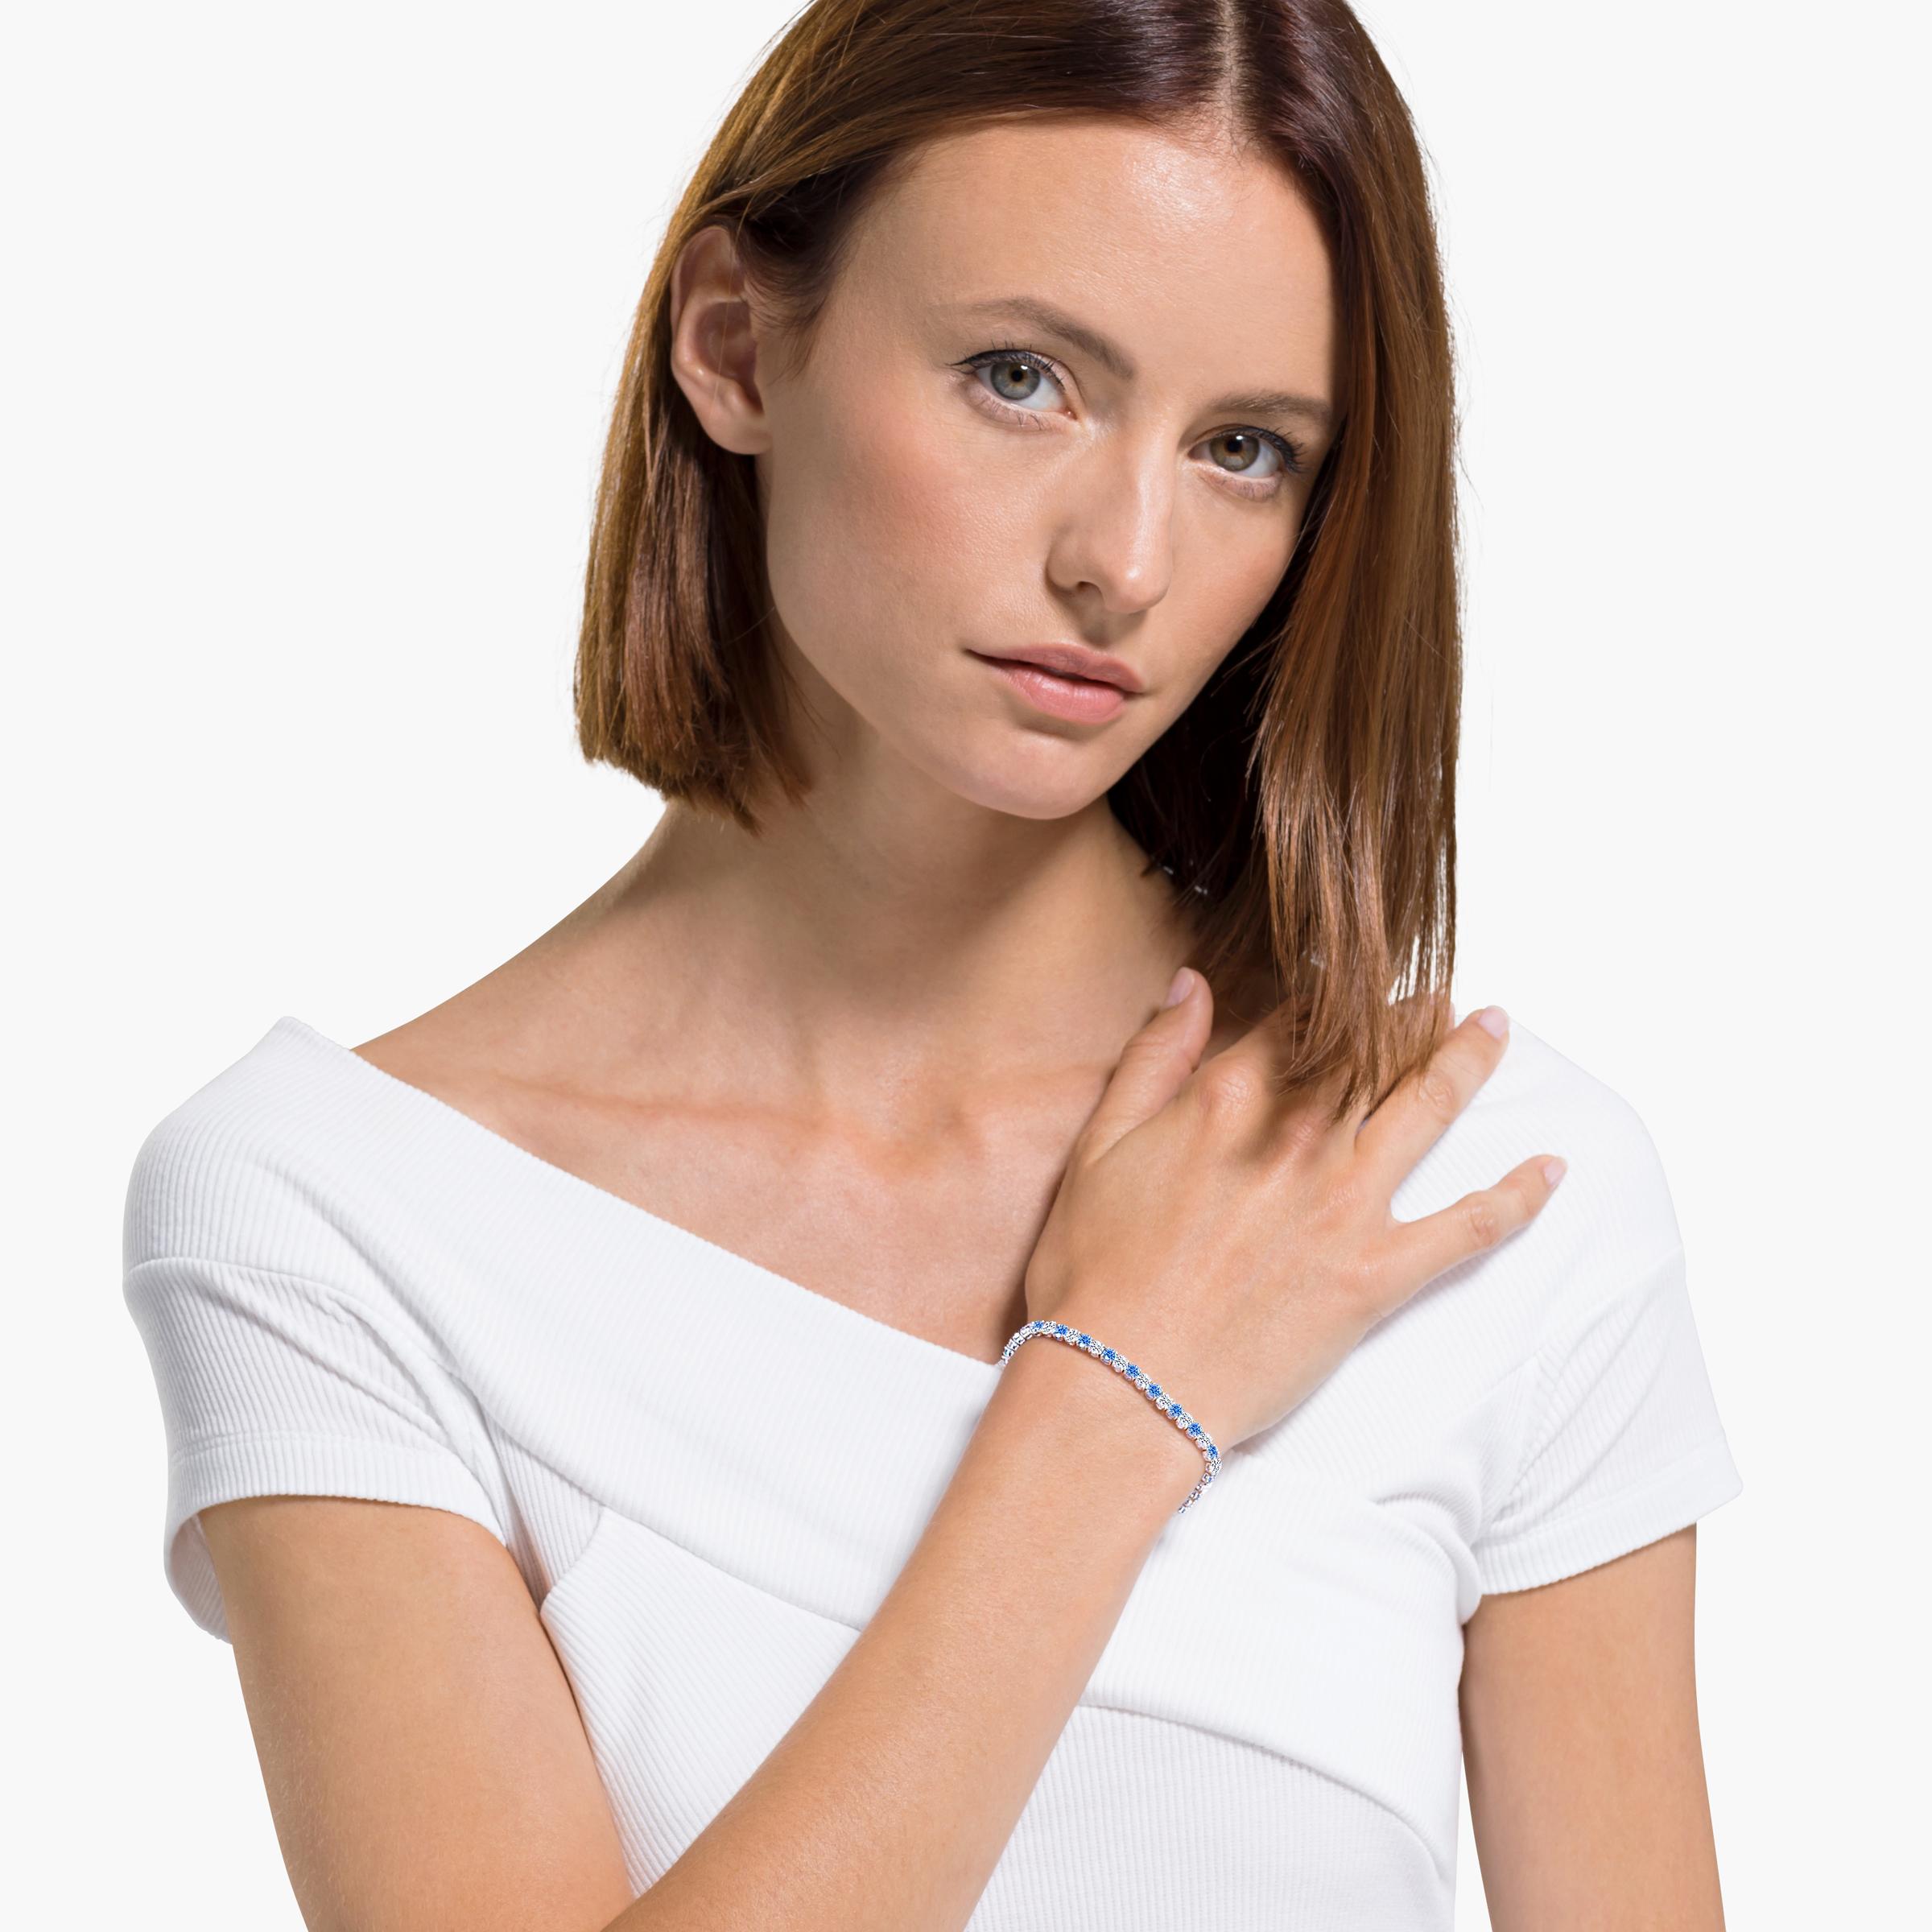 Bracelet Tennis Deluxe, bleu, métal rhodié, Swarovski